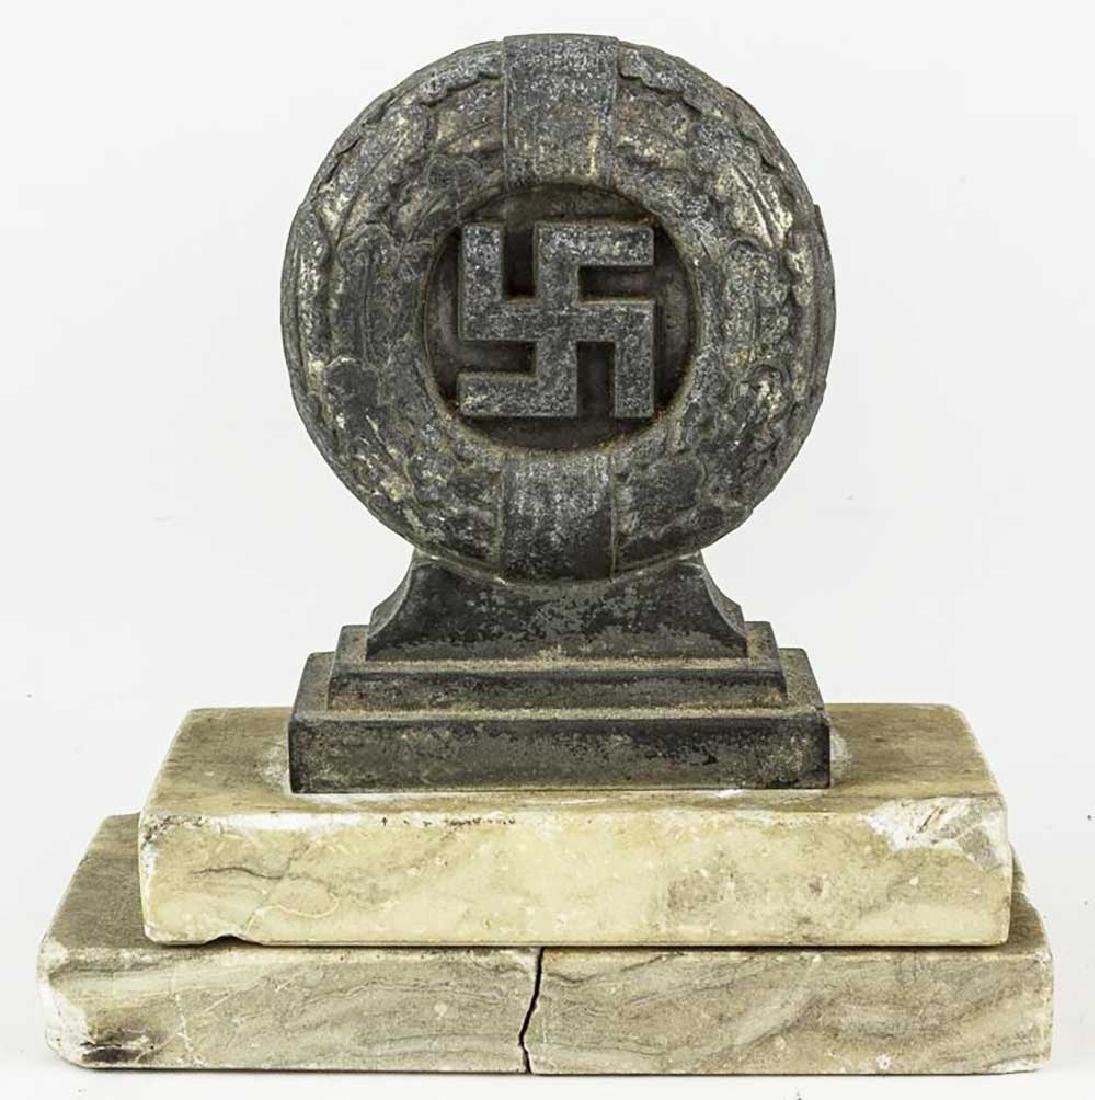 German WWII OAK LEAF WREATH DESK ORNAMENT